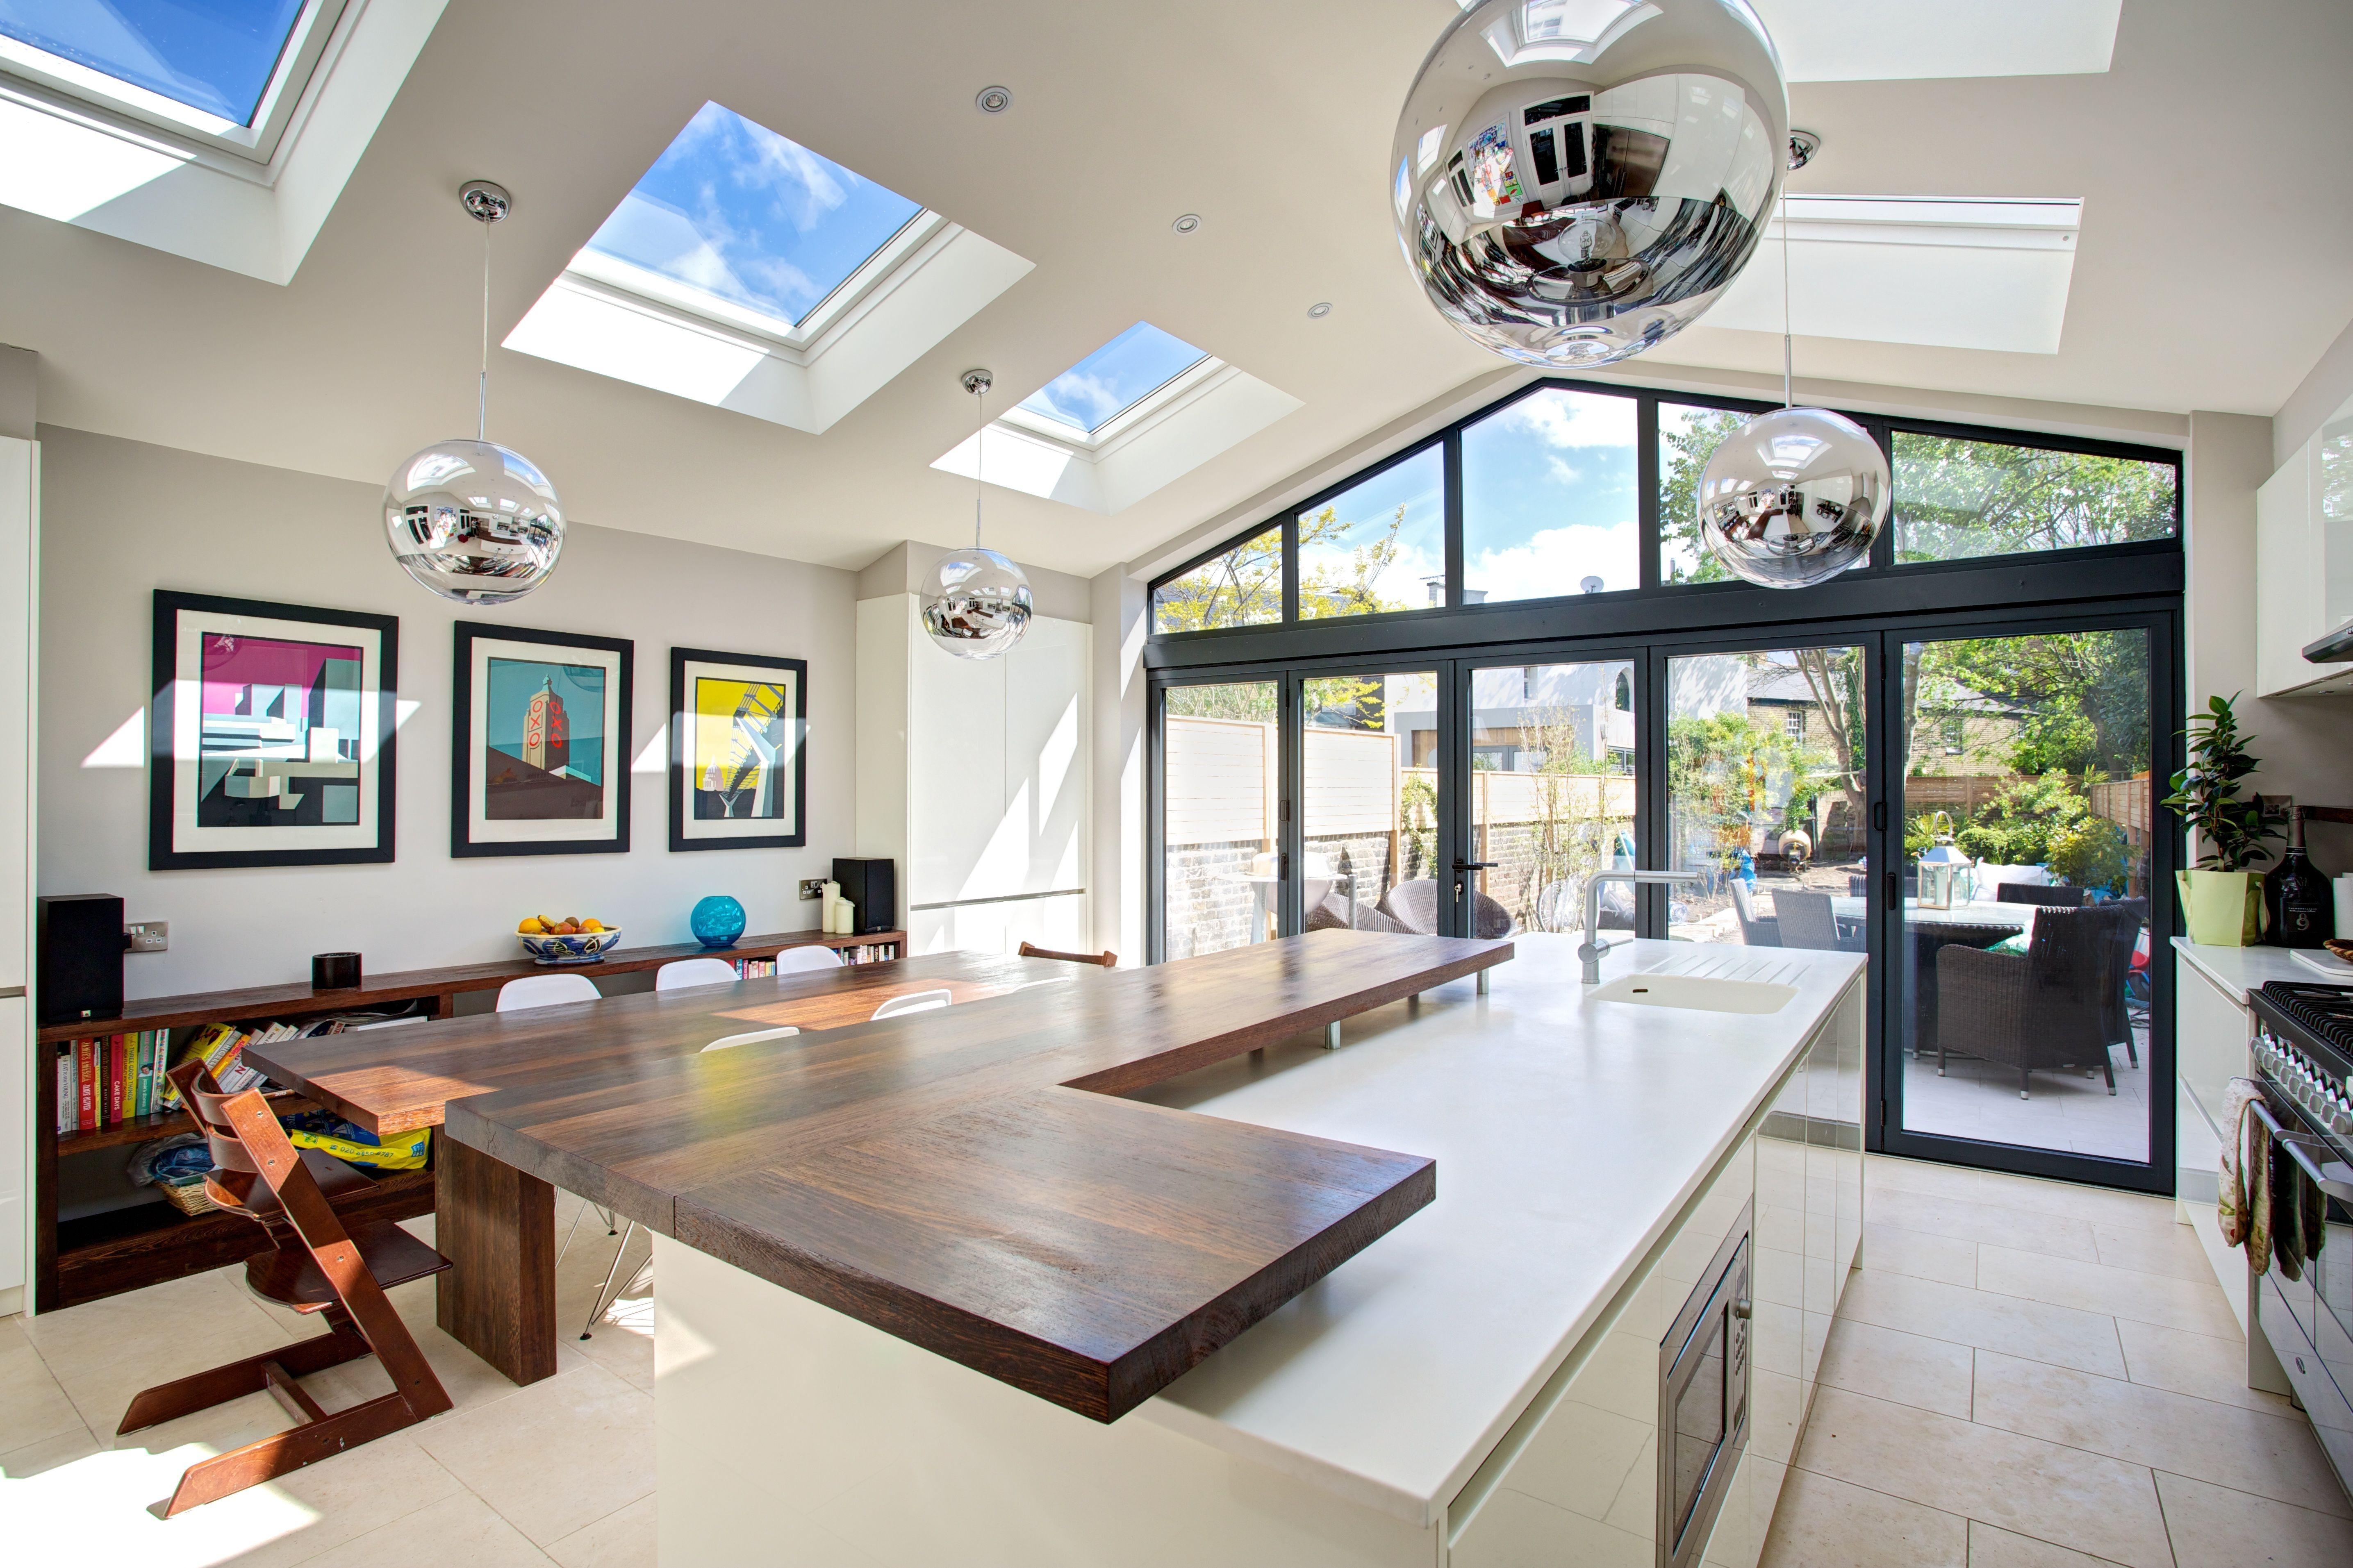 23 Kitchen Window To Living Room 8 Amazing Floor To Ceiling Windows Ideas In Modern Open Plan Kitchen Living Room Kitchen Extension Kitchen Extension Lighting